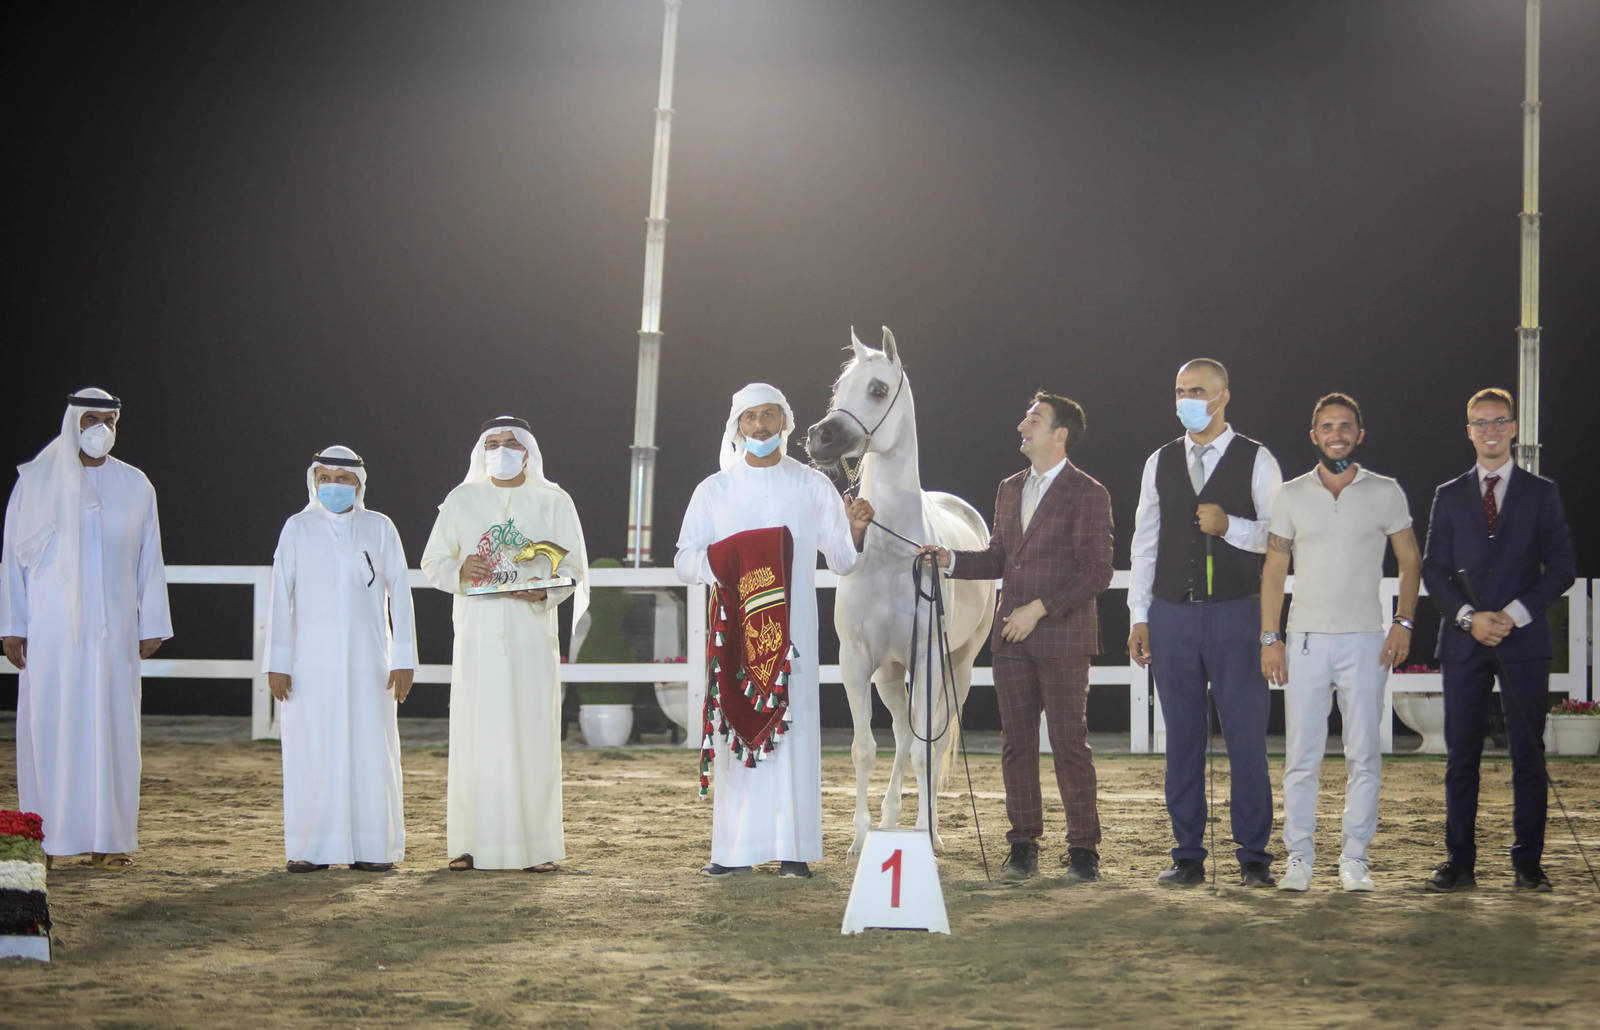 KALBA ARABIAN HORSE FESTIVAL 2020